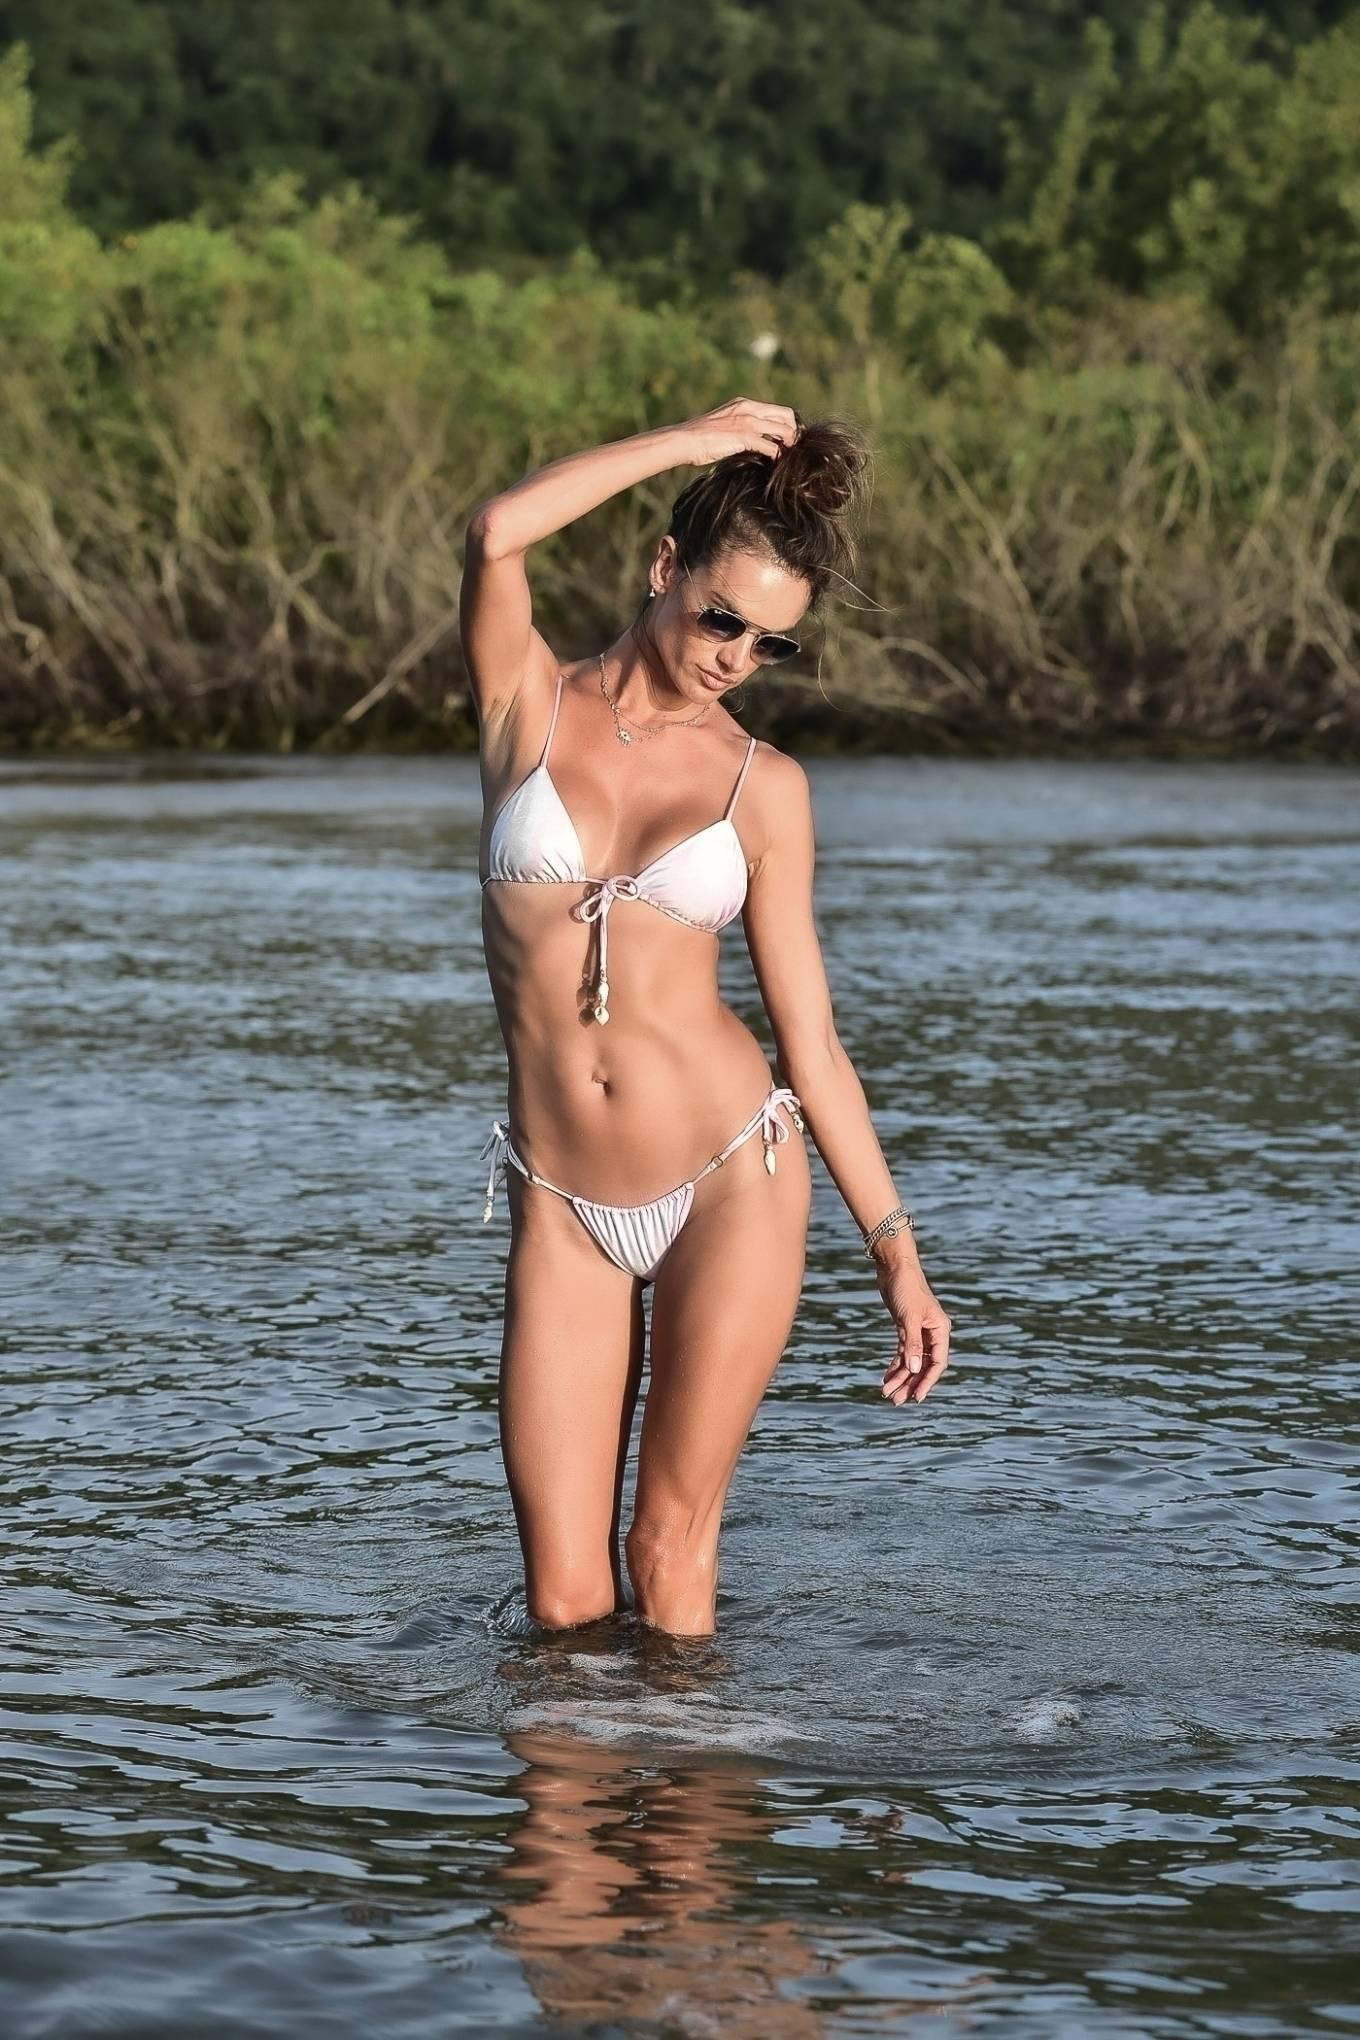 Alessandra Ambrosio - In a two-piece bikini on a photo shoot in Florianopolis